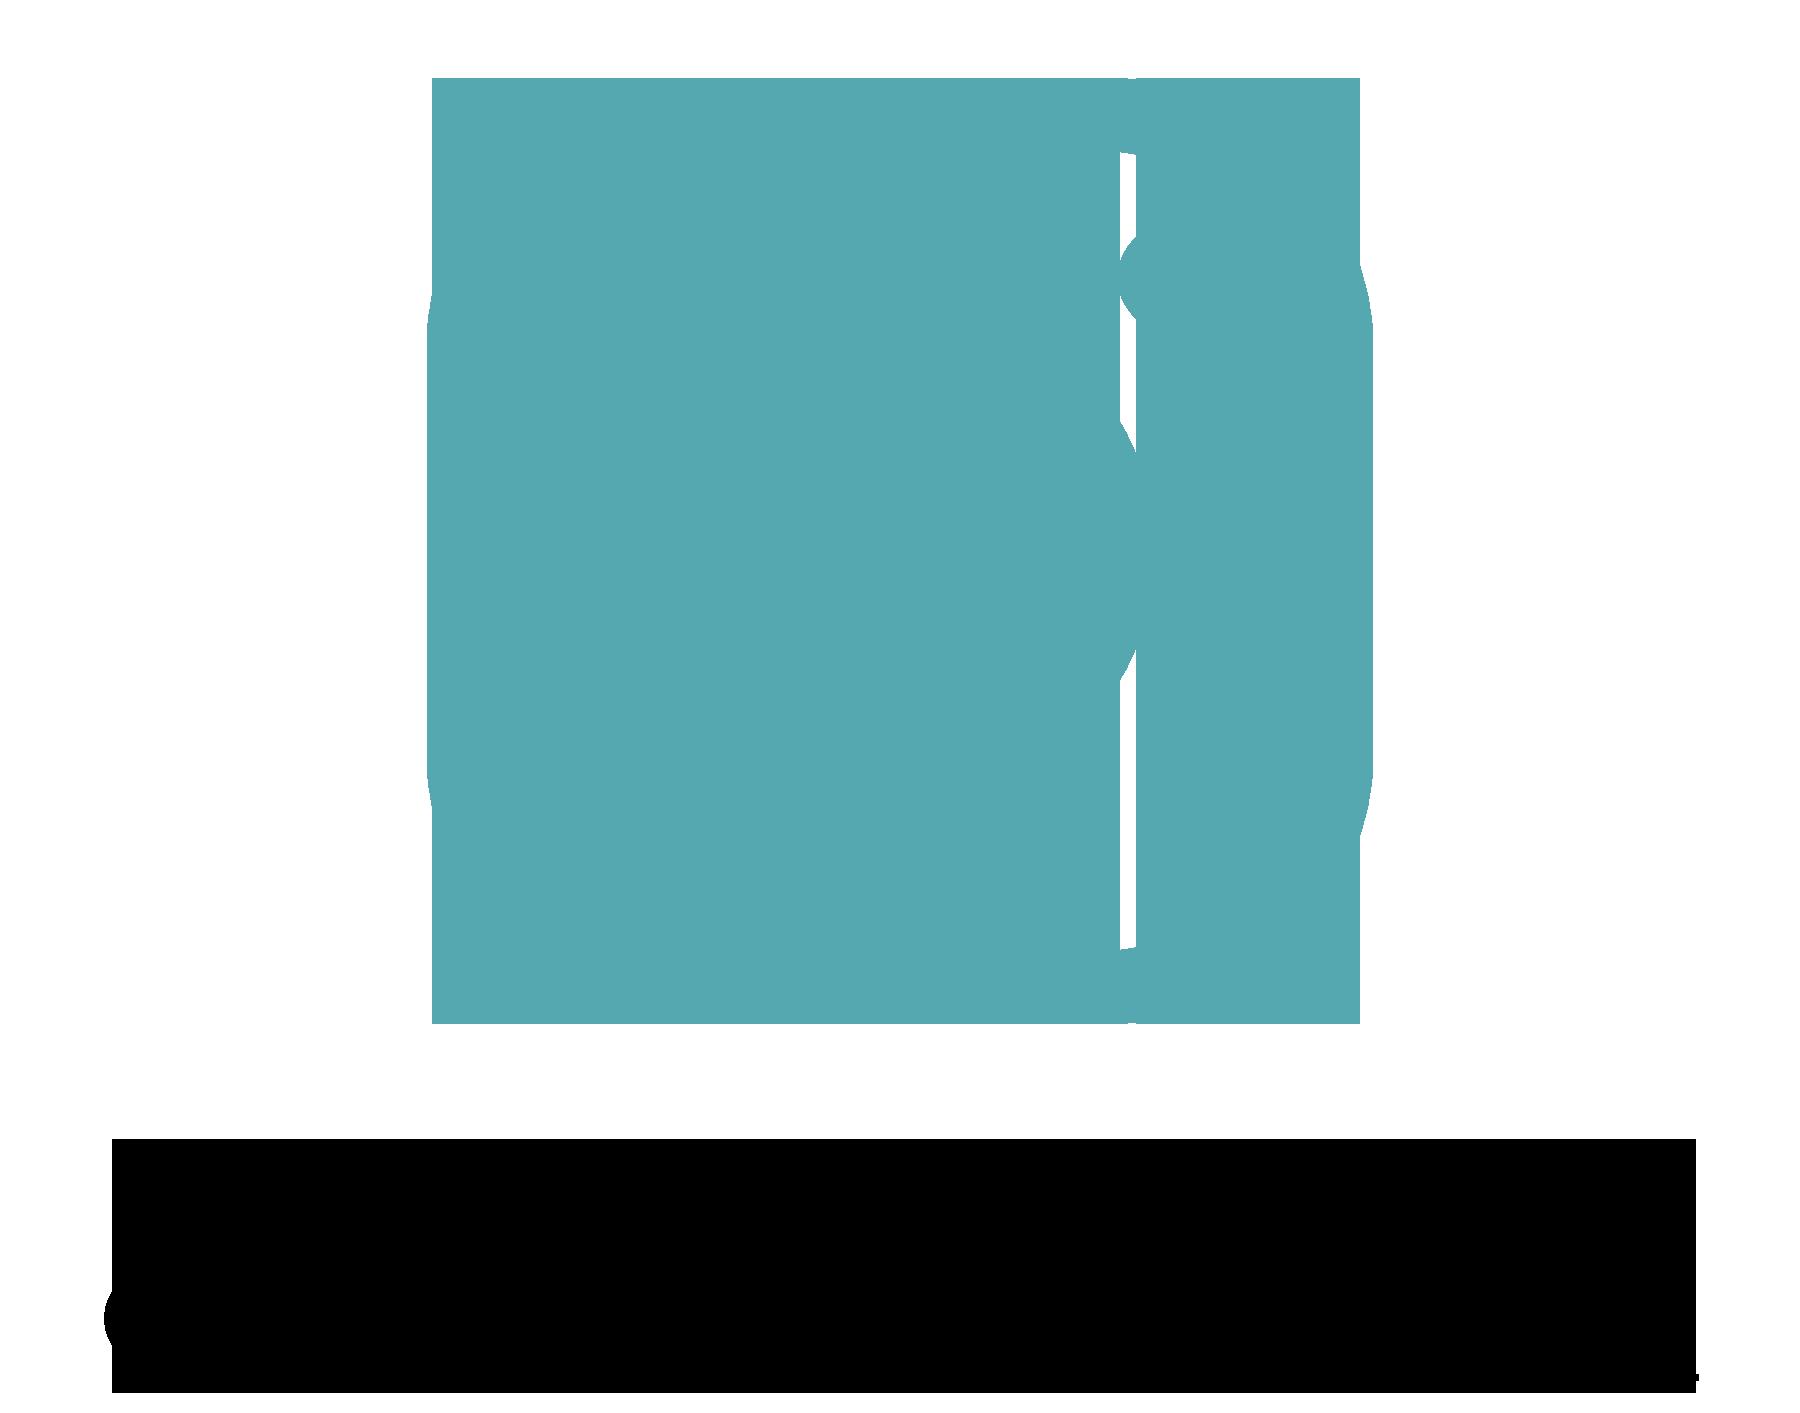 Image of Instagram logo. Follow us at KissAndMakeupCosmetics_ account.